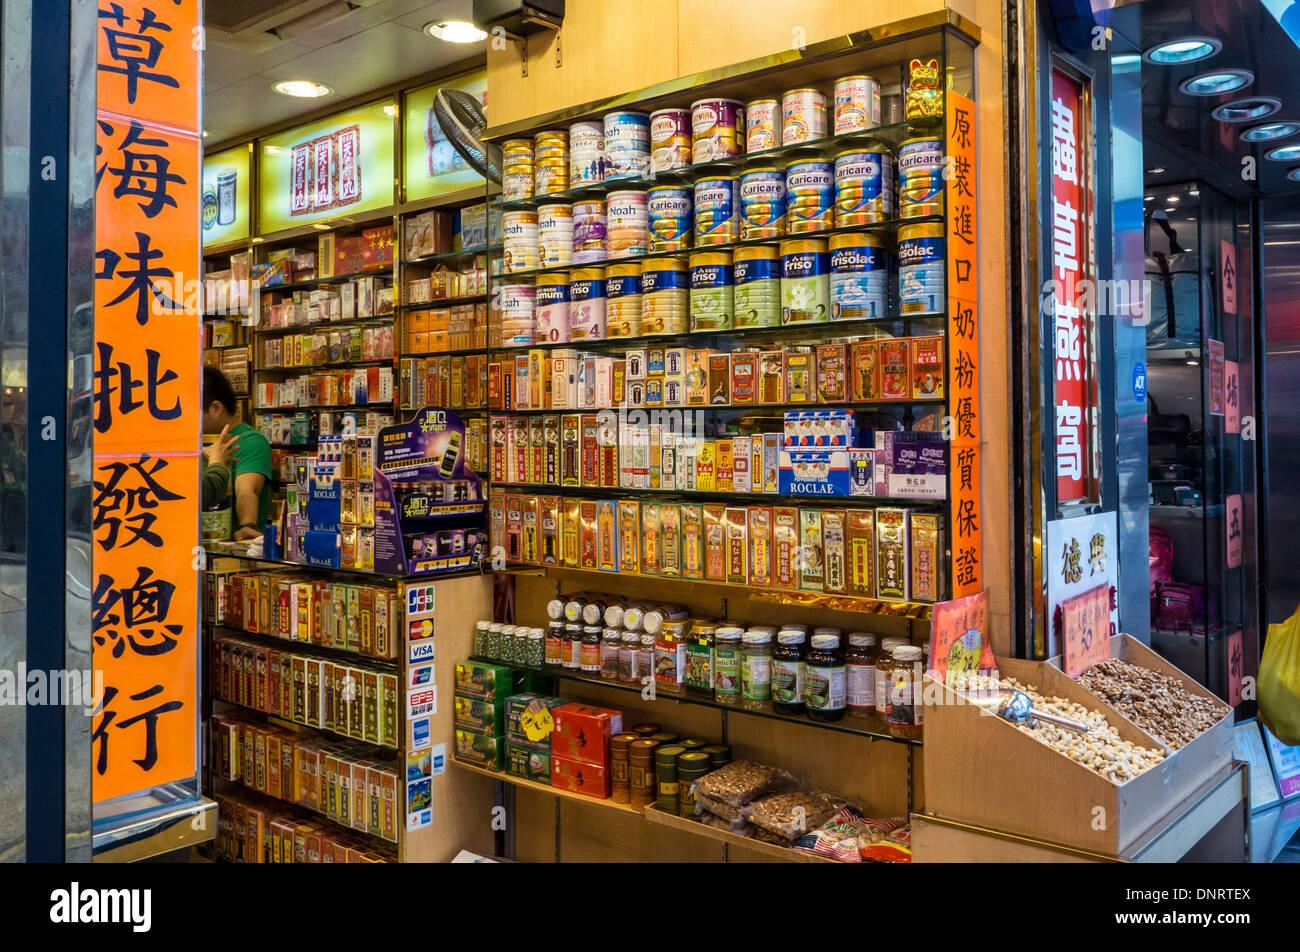 Grocery Store in Tsim Sha Tsui, Kowloon, Hong Kong, China - Stock Image